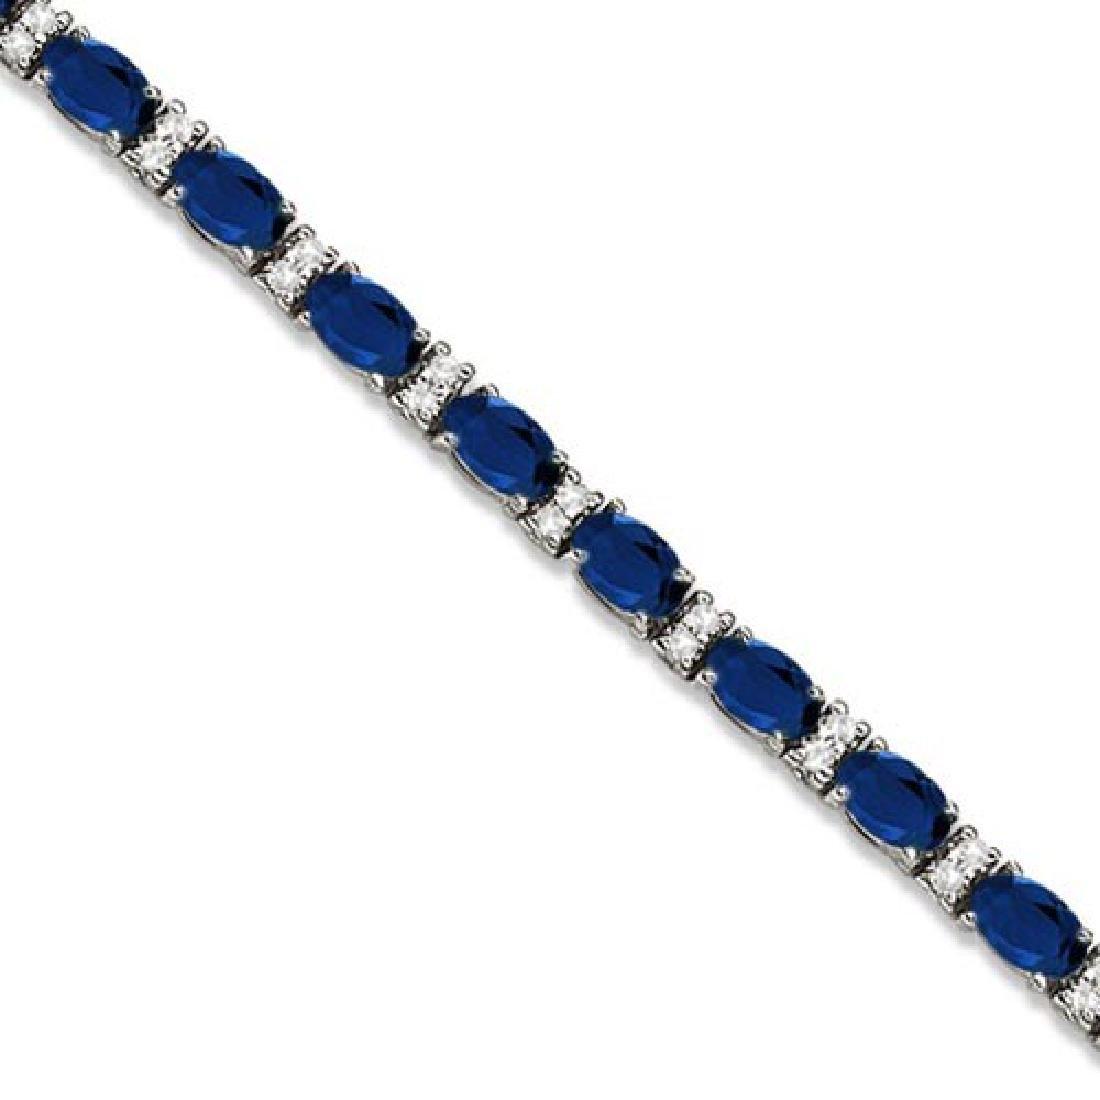 Diamond and Oval Cut Sapphire Tennis Bracelet 14k White